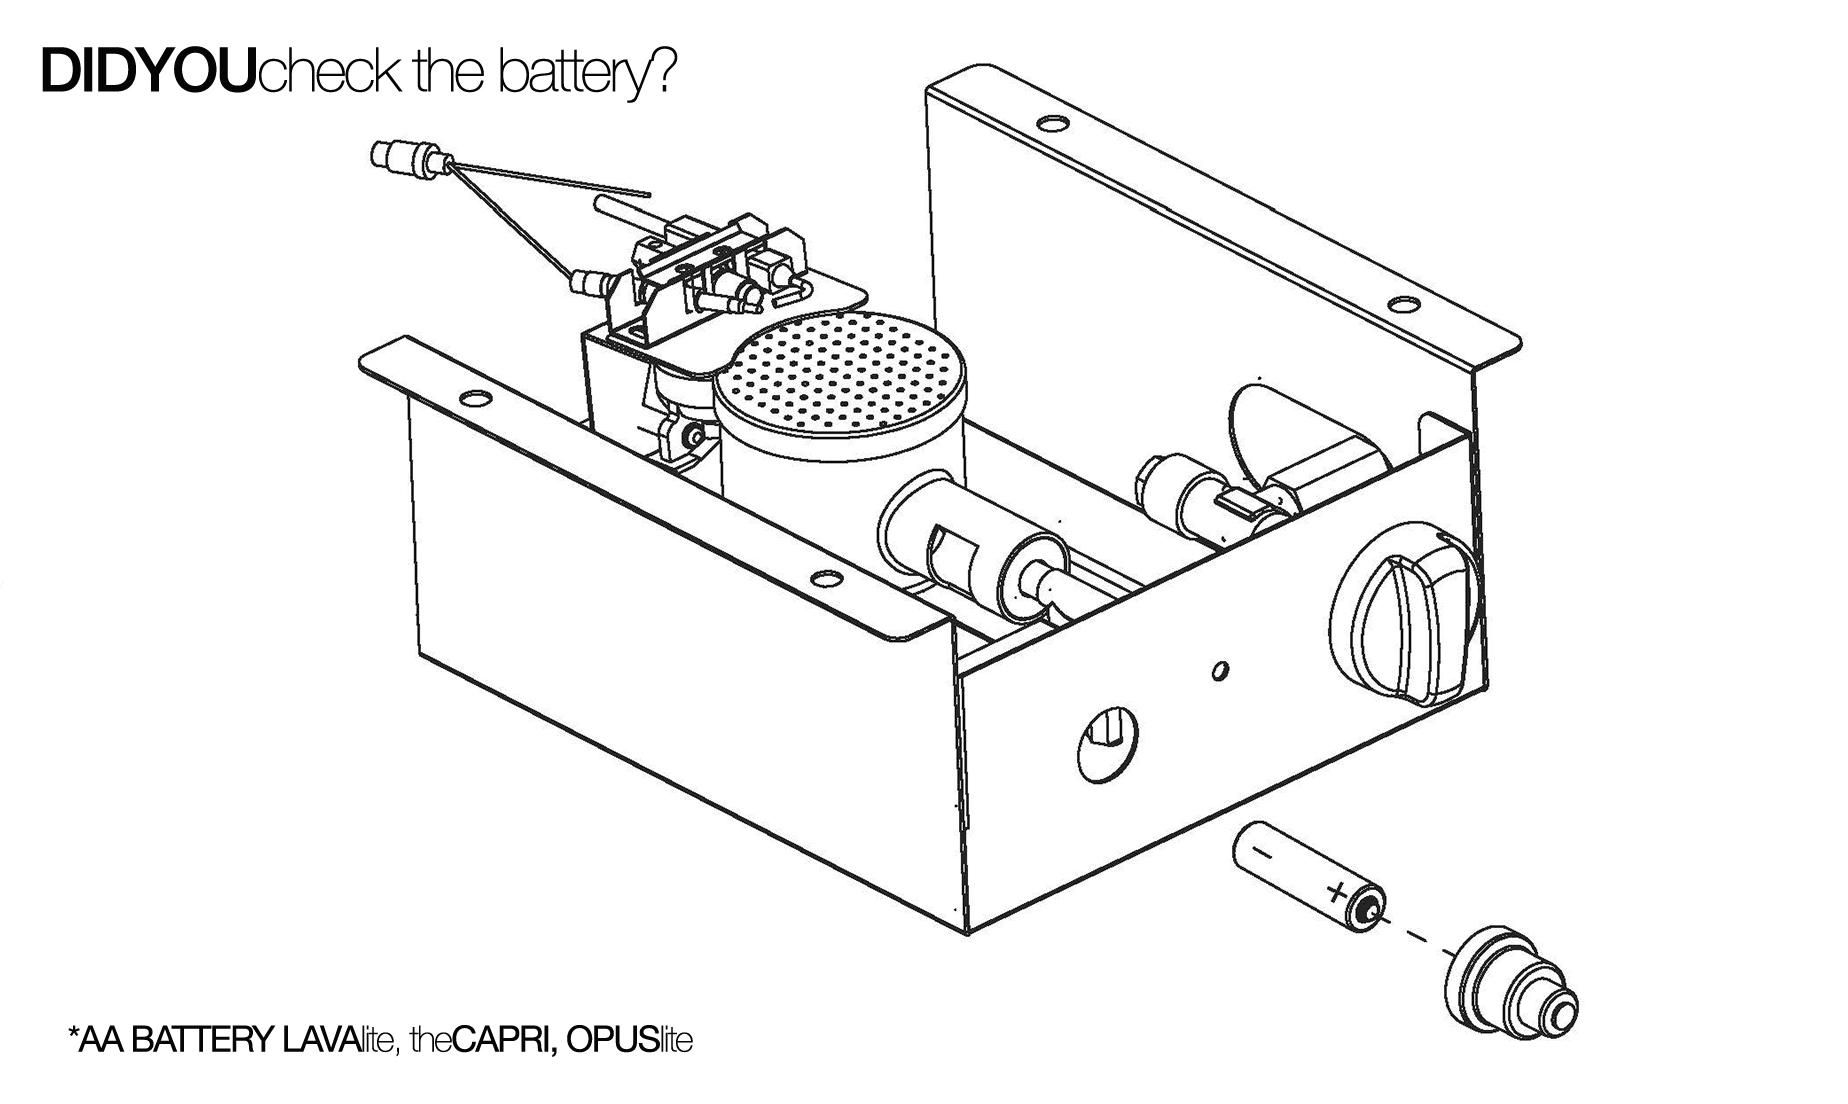 battery1920x1080.jpg